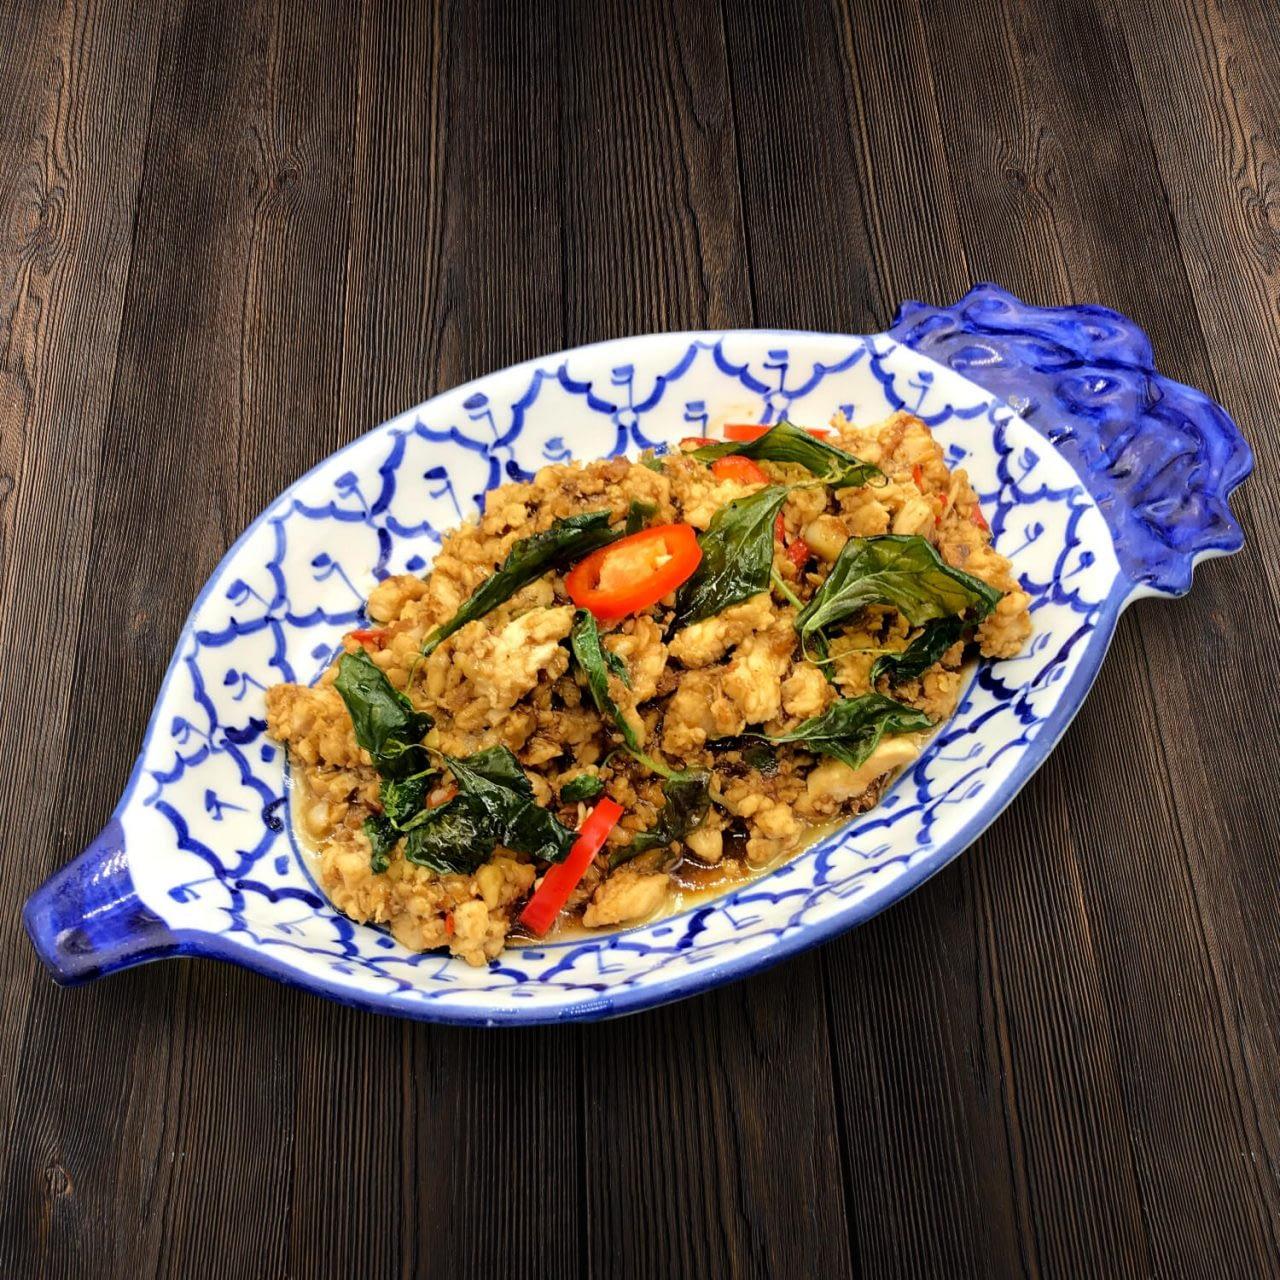 Thai Food Delivery Kuala Lumpur Thai Basil Leaf Minced Chicken